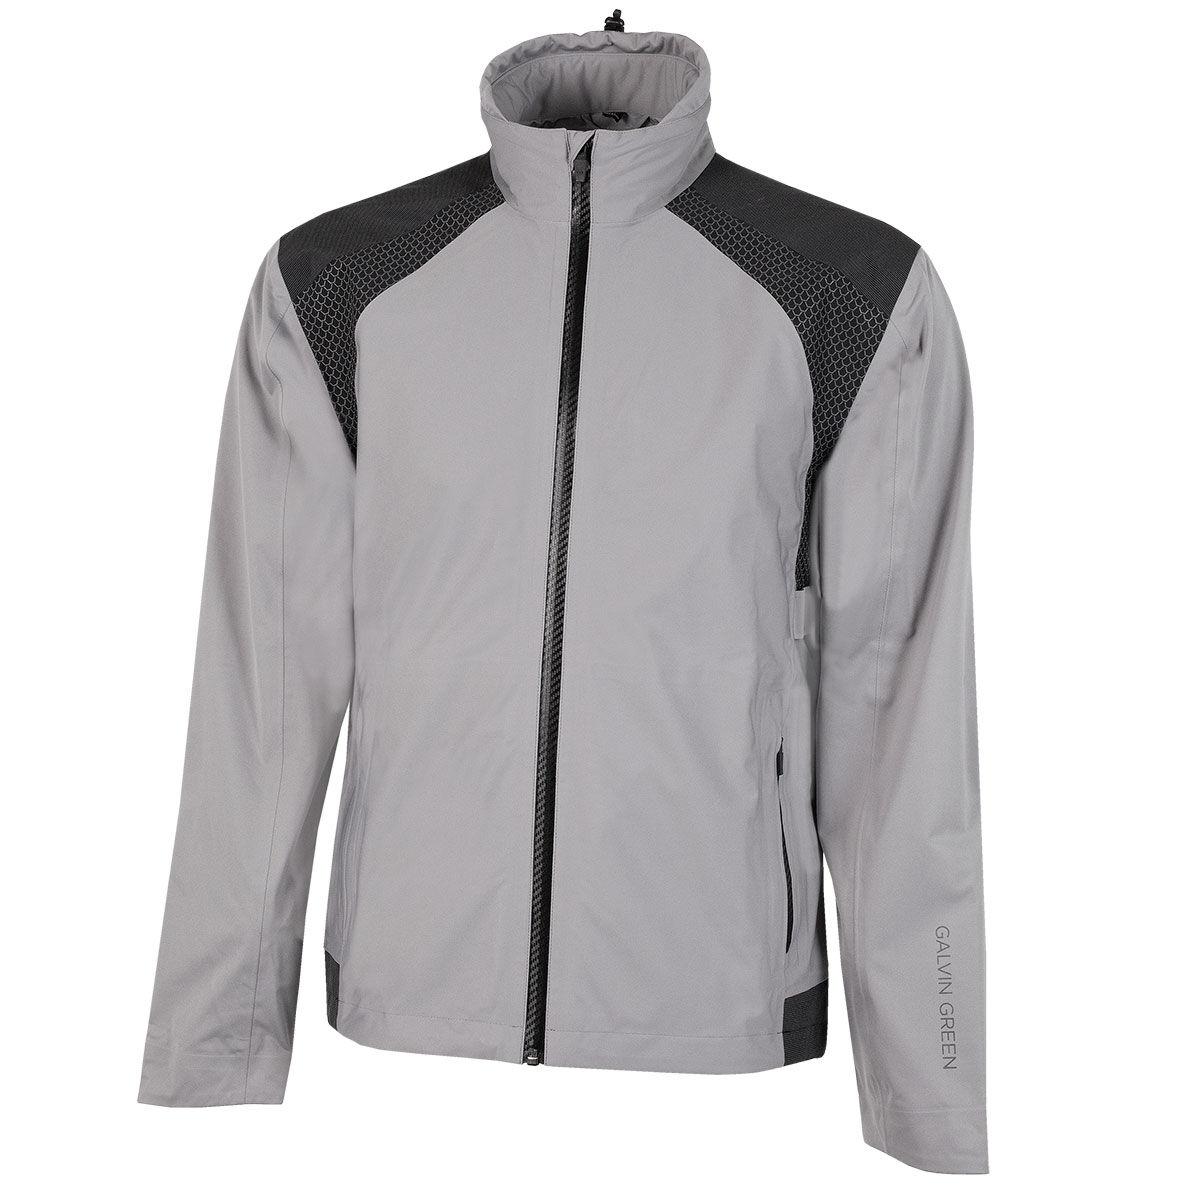 Galvin Green Action Waterproof Golf Jacket, Mens, Small, Sharkskin/black   American Golf